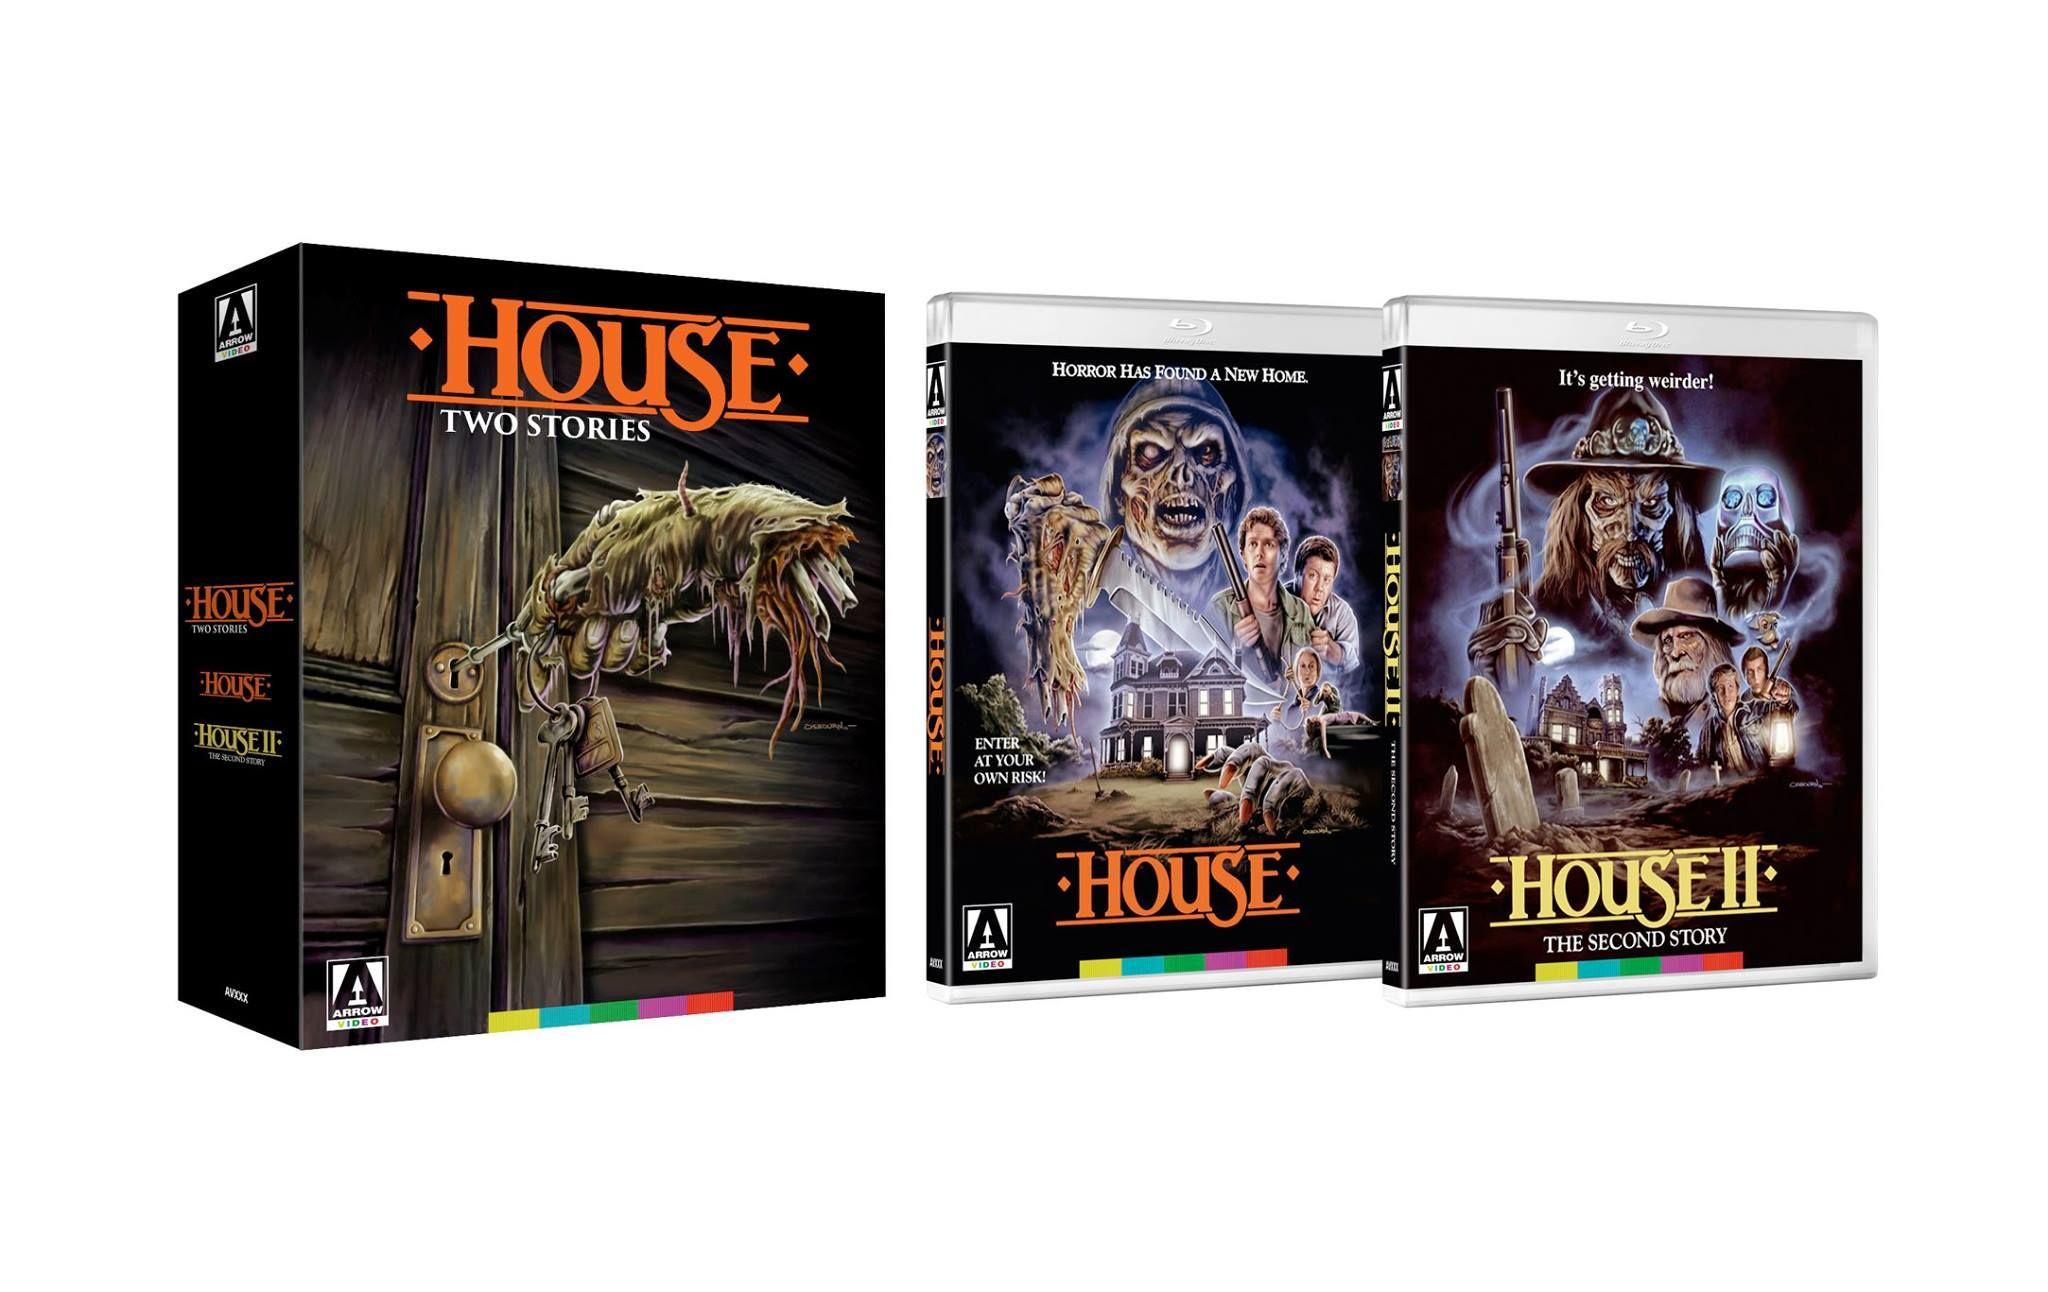 House I + II Limited Edition Bluray (Arrow Video) Hoeden